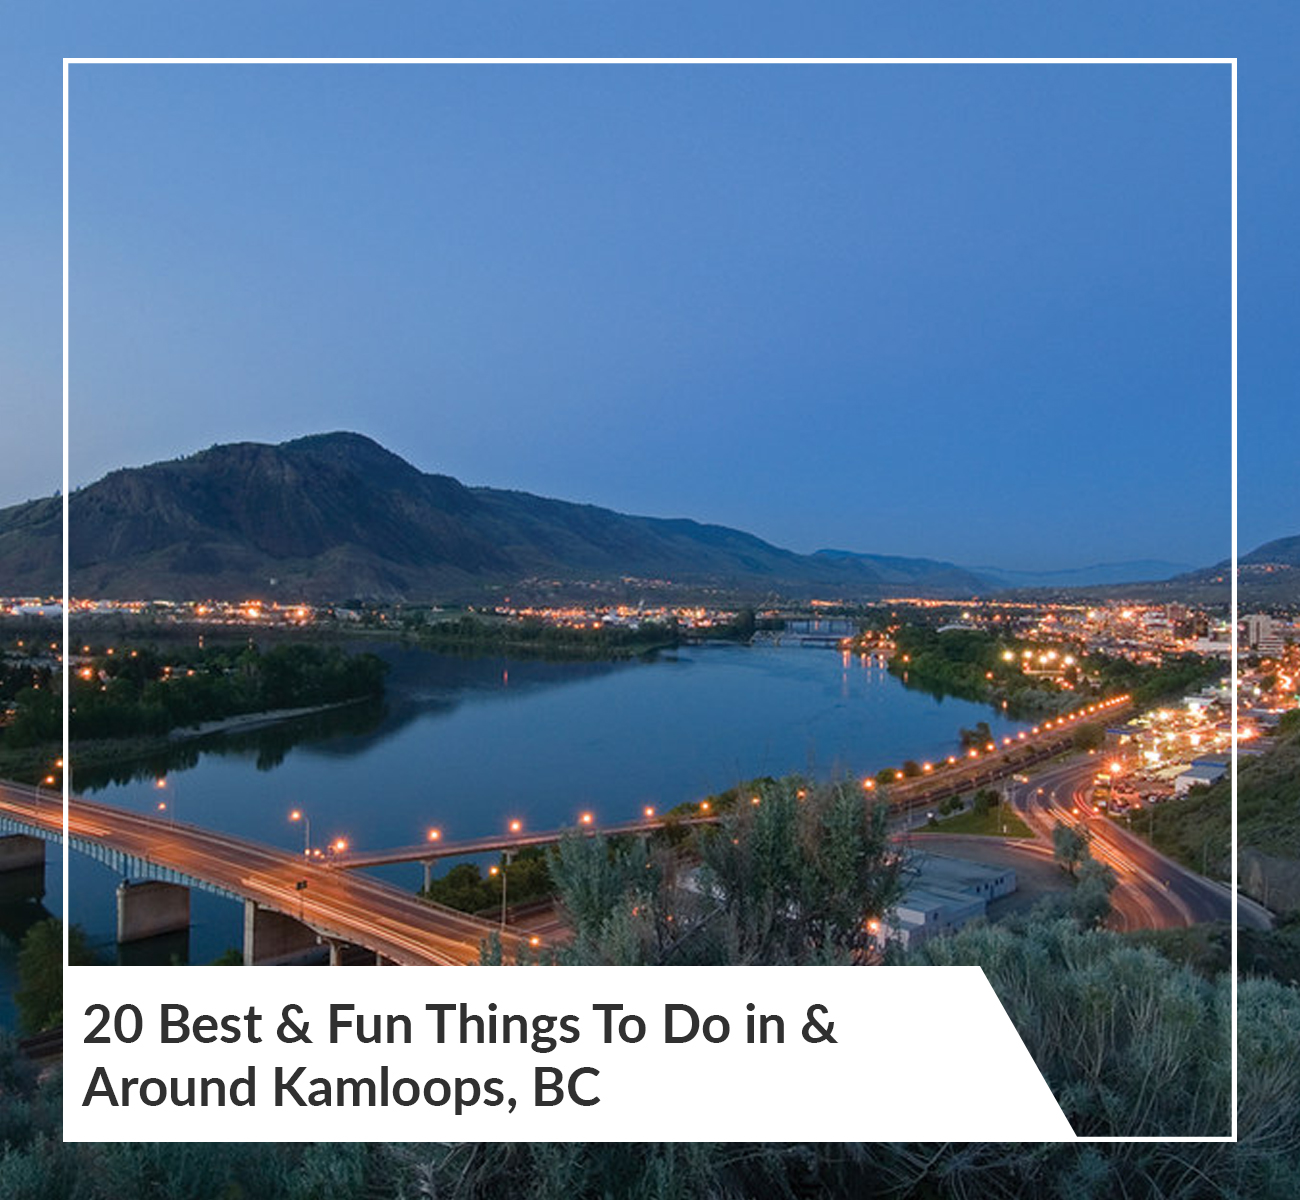 Best Things To Do Kamloops, BC